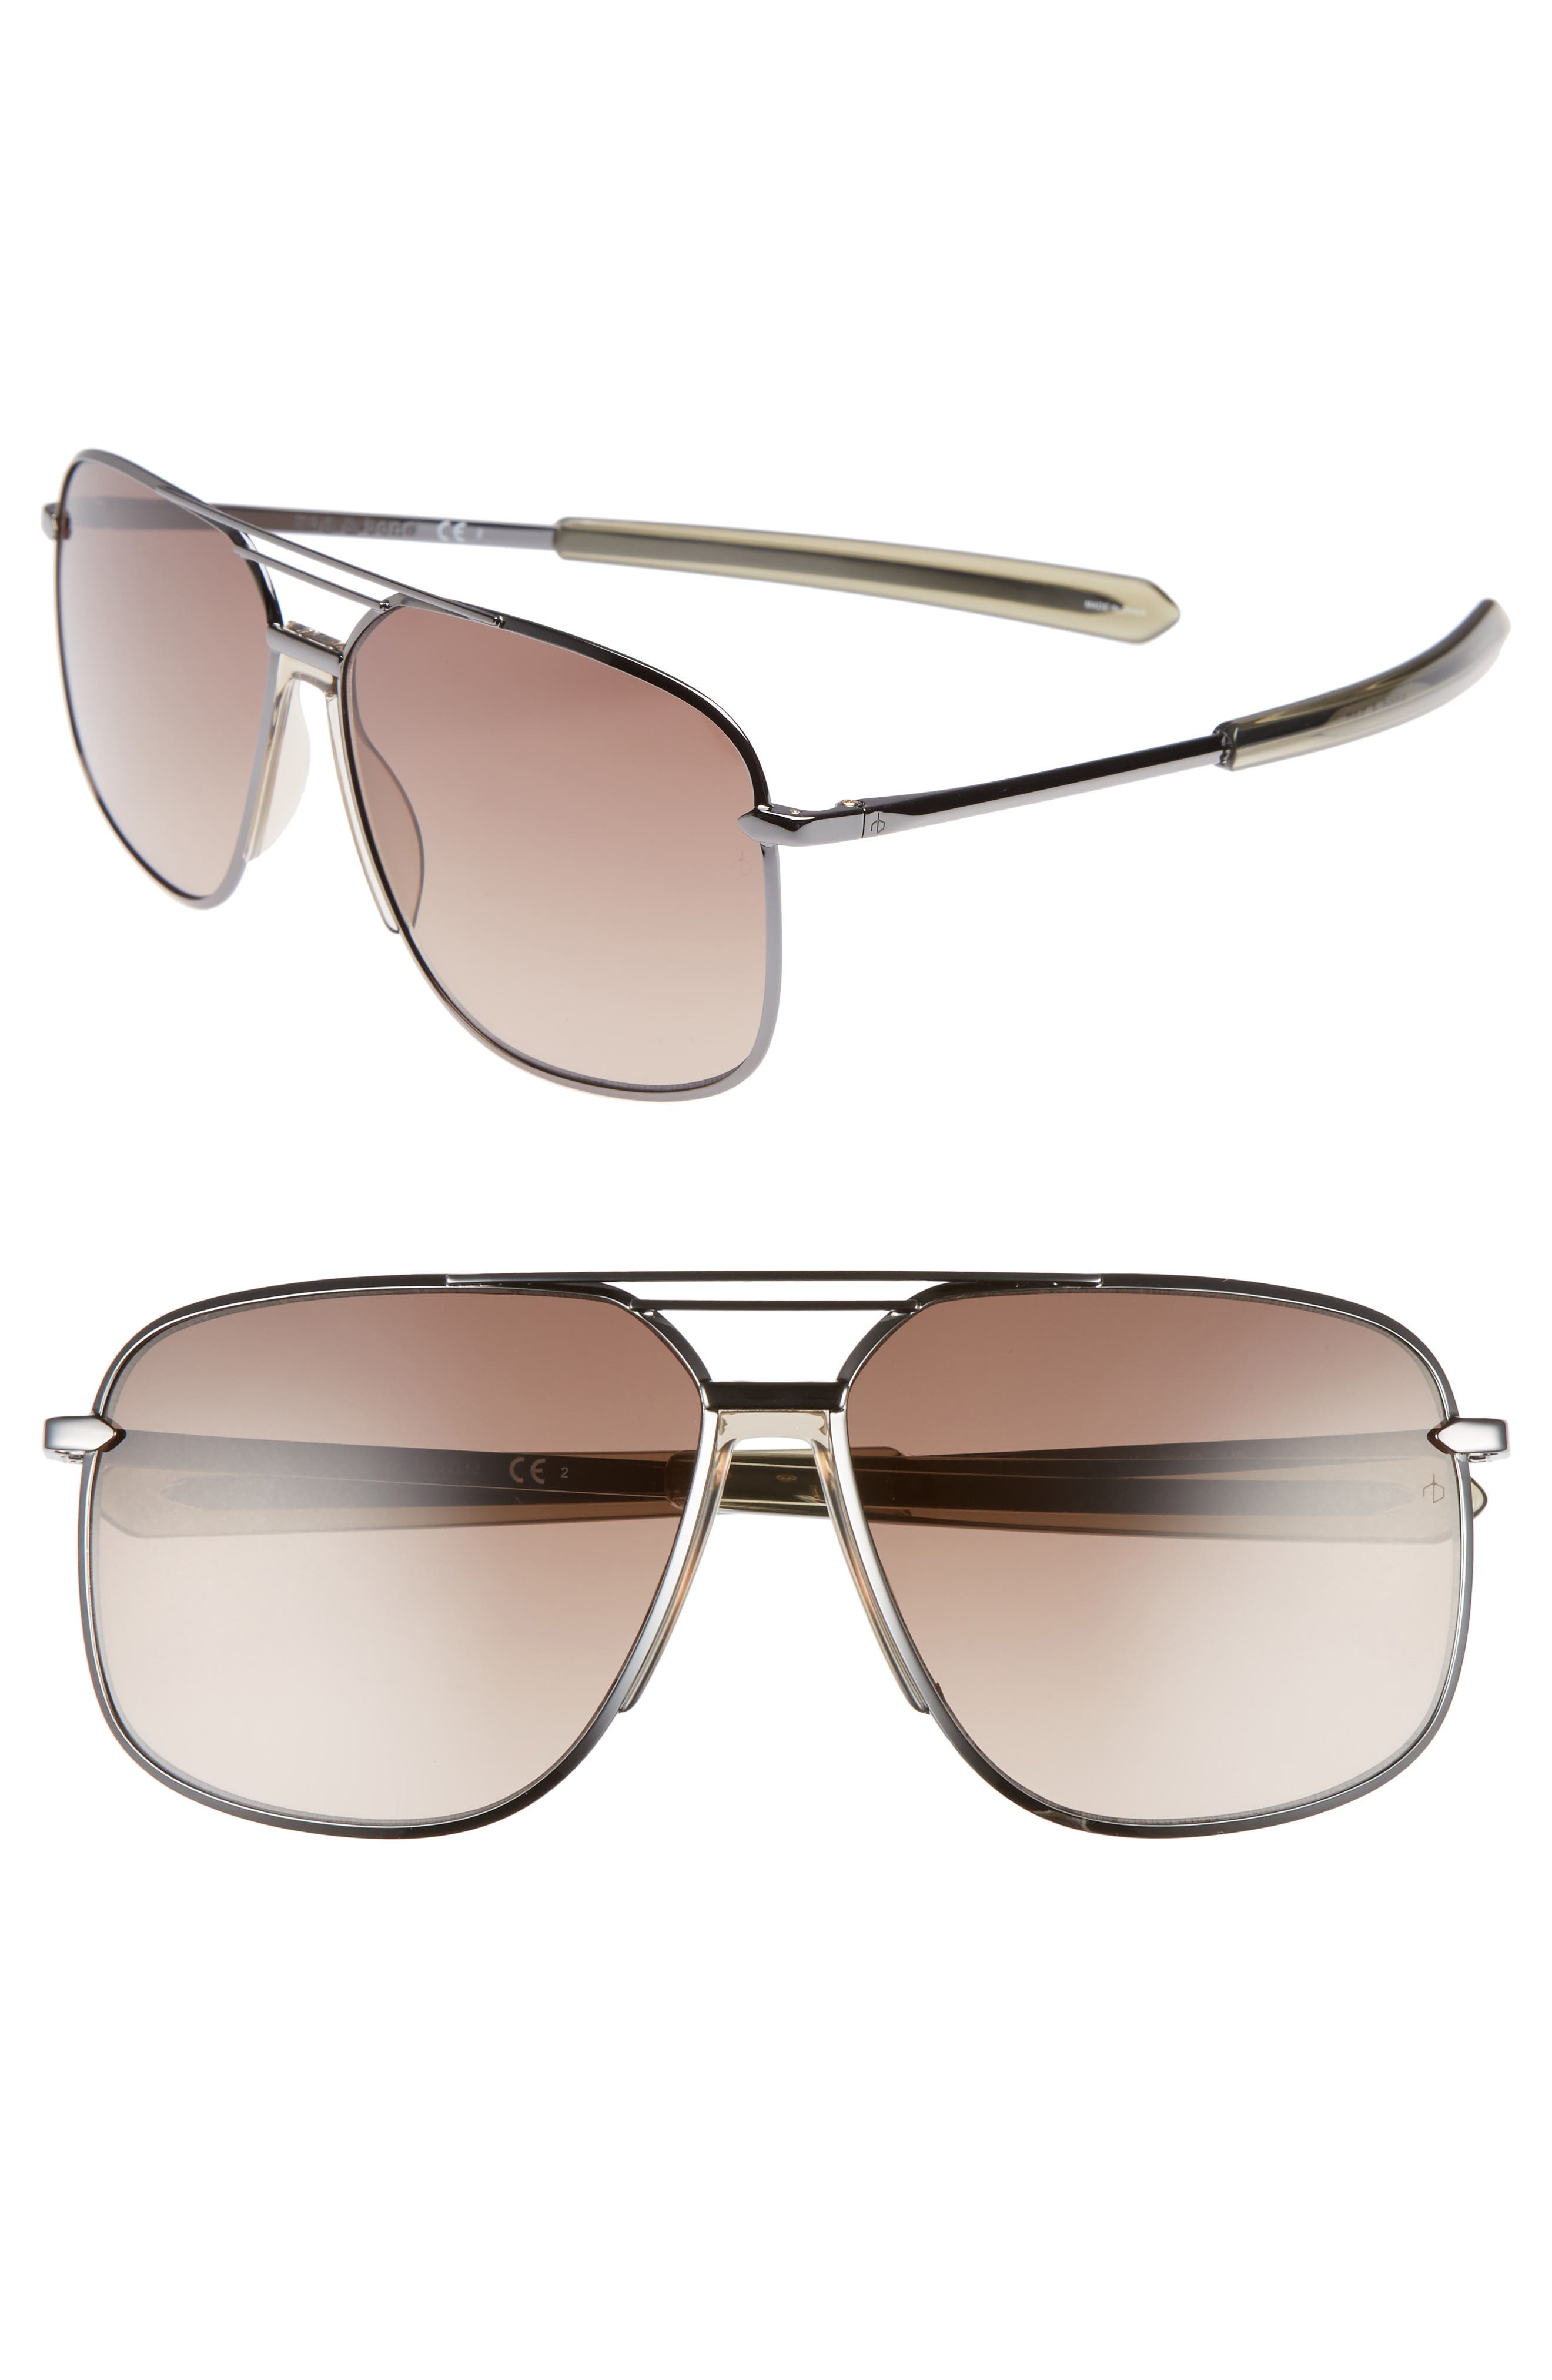 rag & bone Caravan 62mm Oversize Aviator Sunglasses